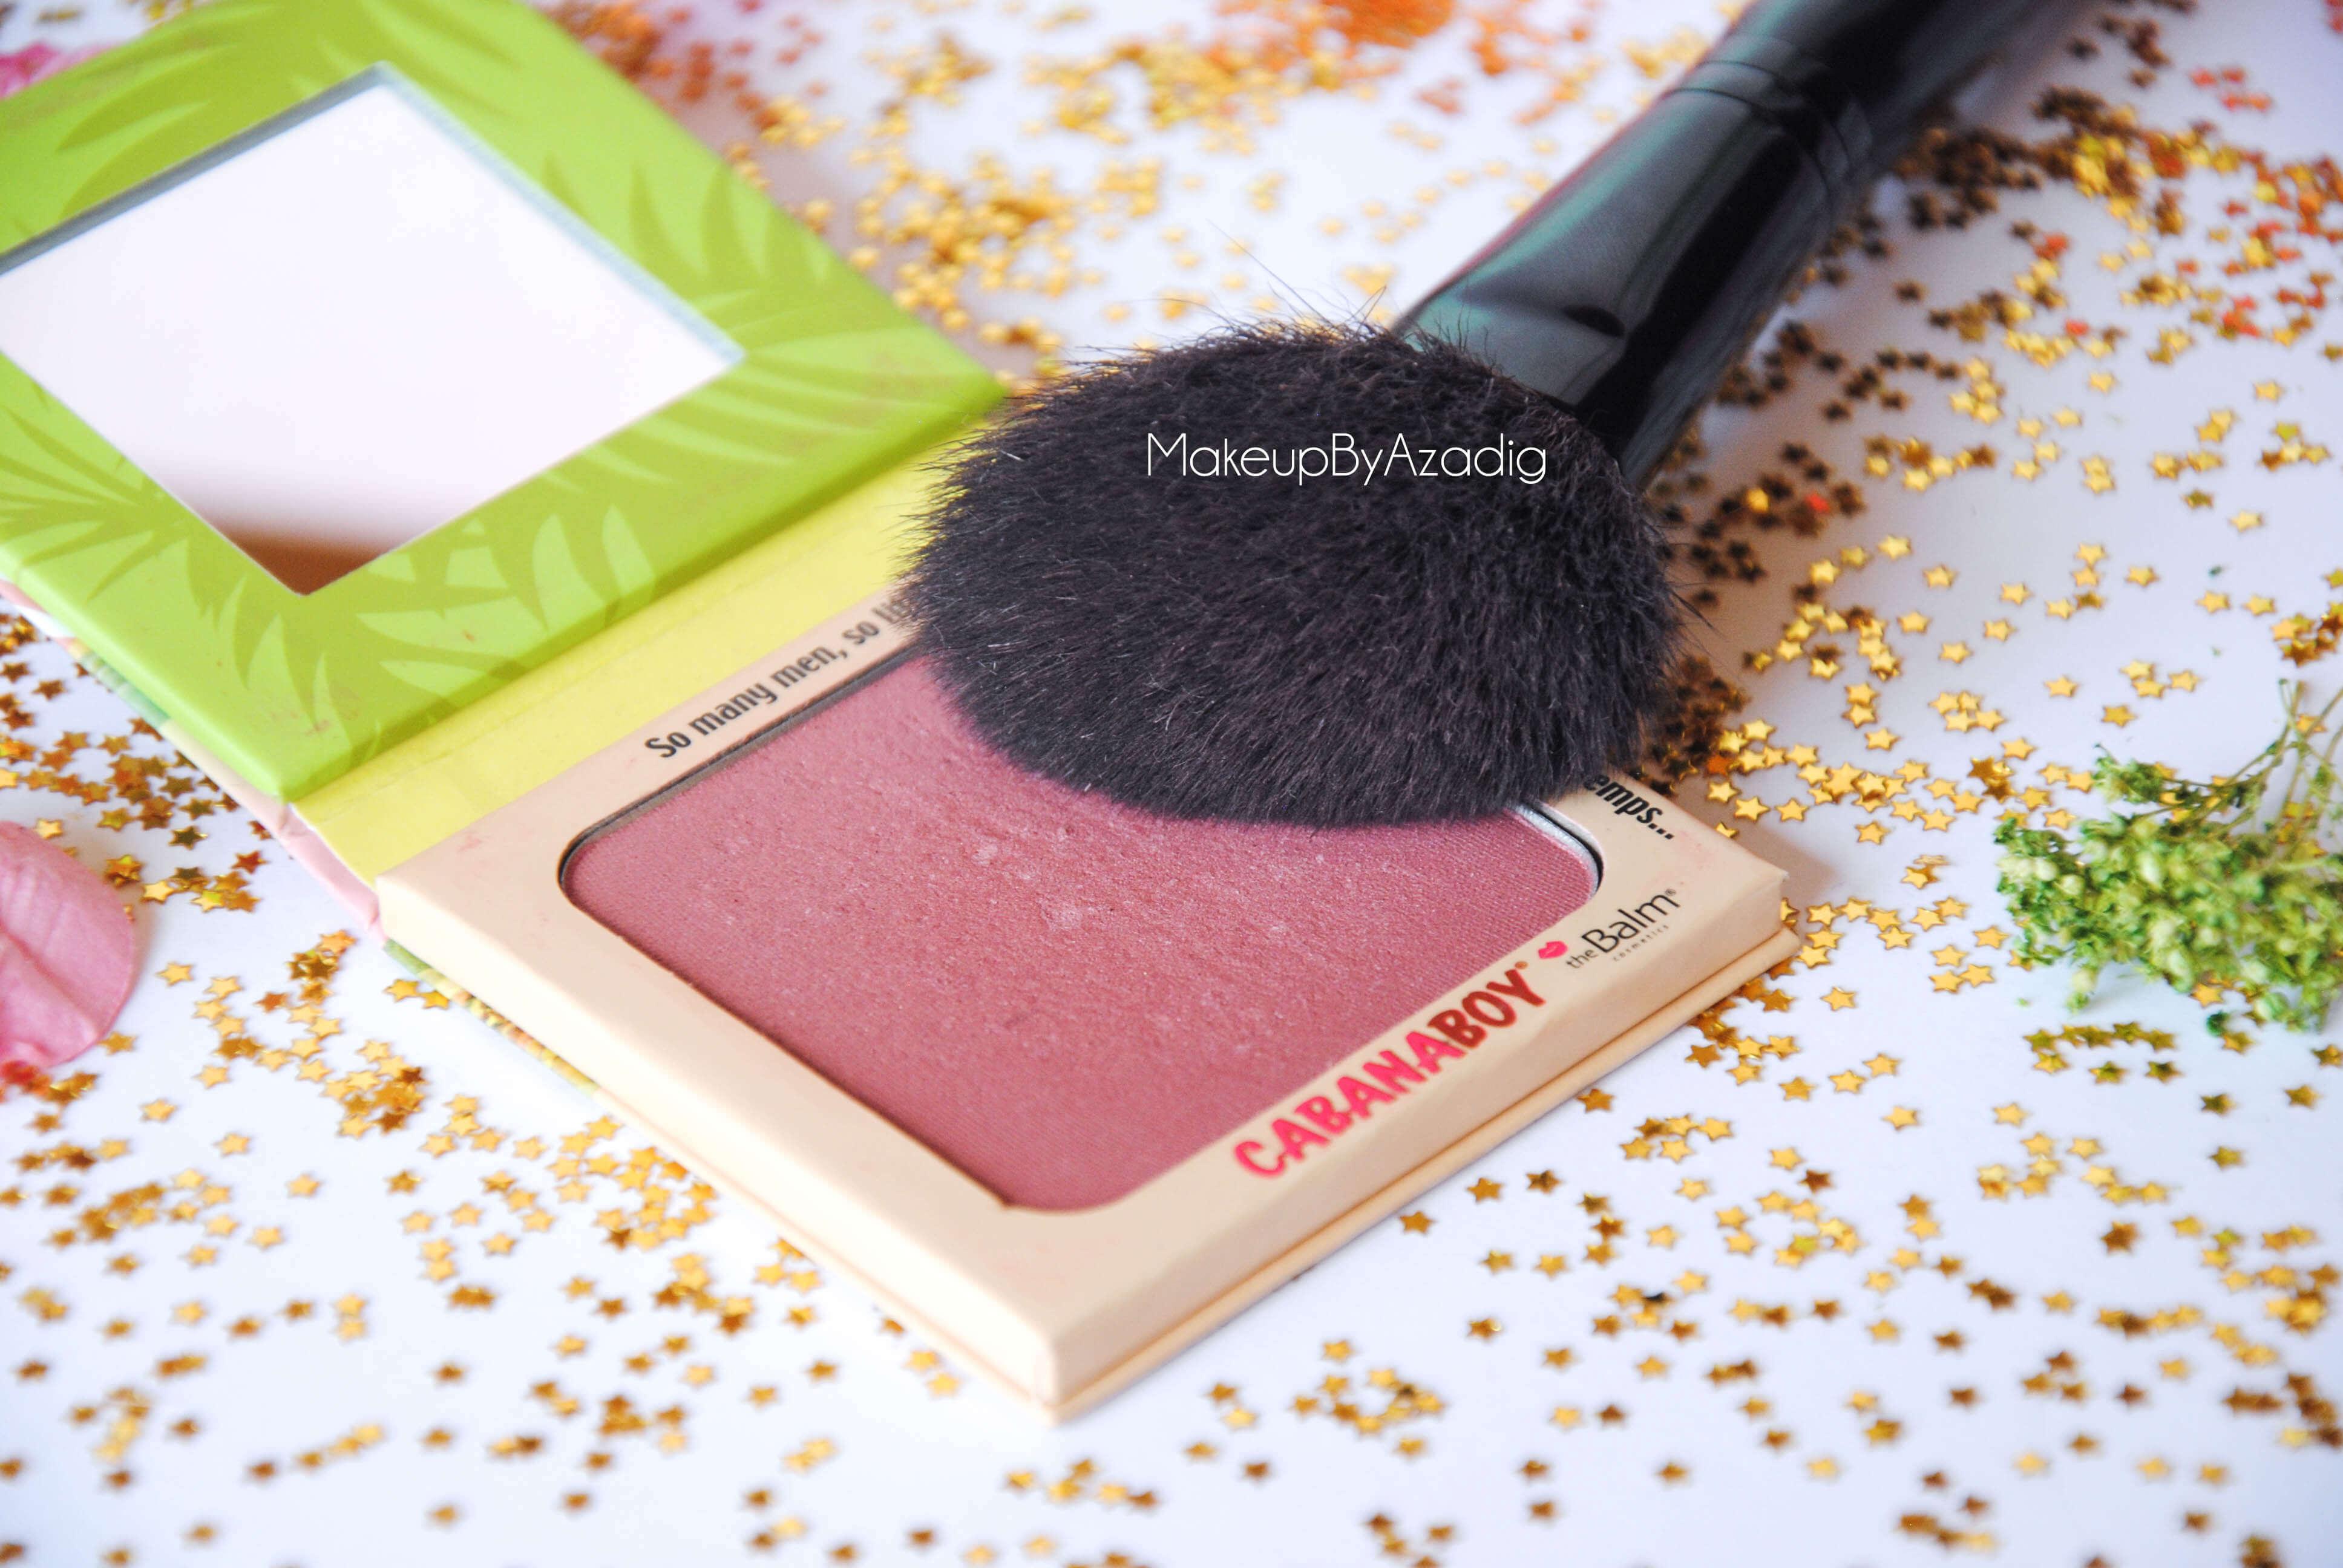 cabanaboy-the balm-blush rose fonce-monoprix-beaute privee-the beautyst-makeupbyazadig-mauve